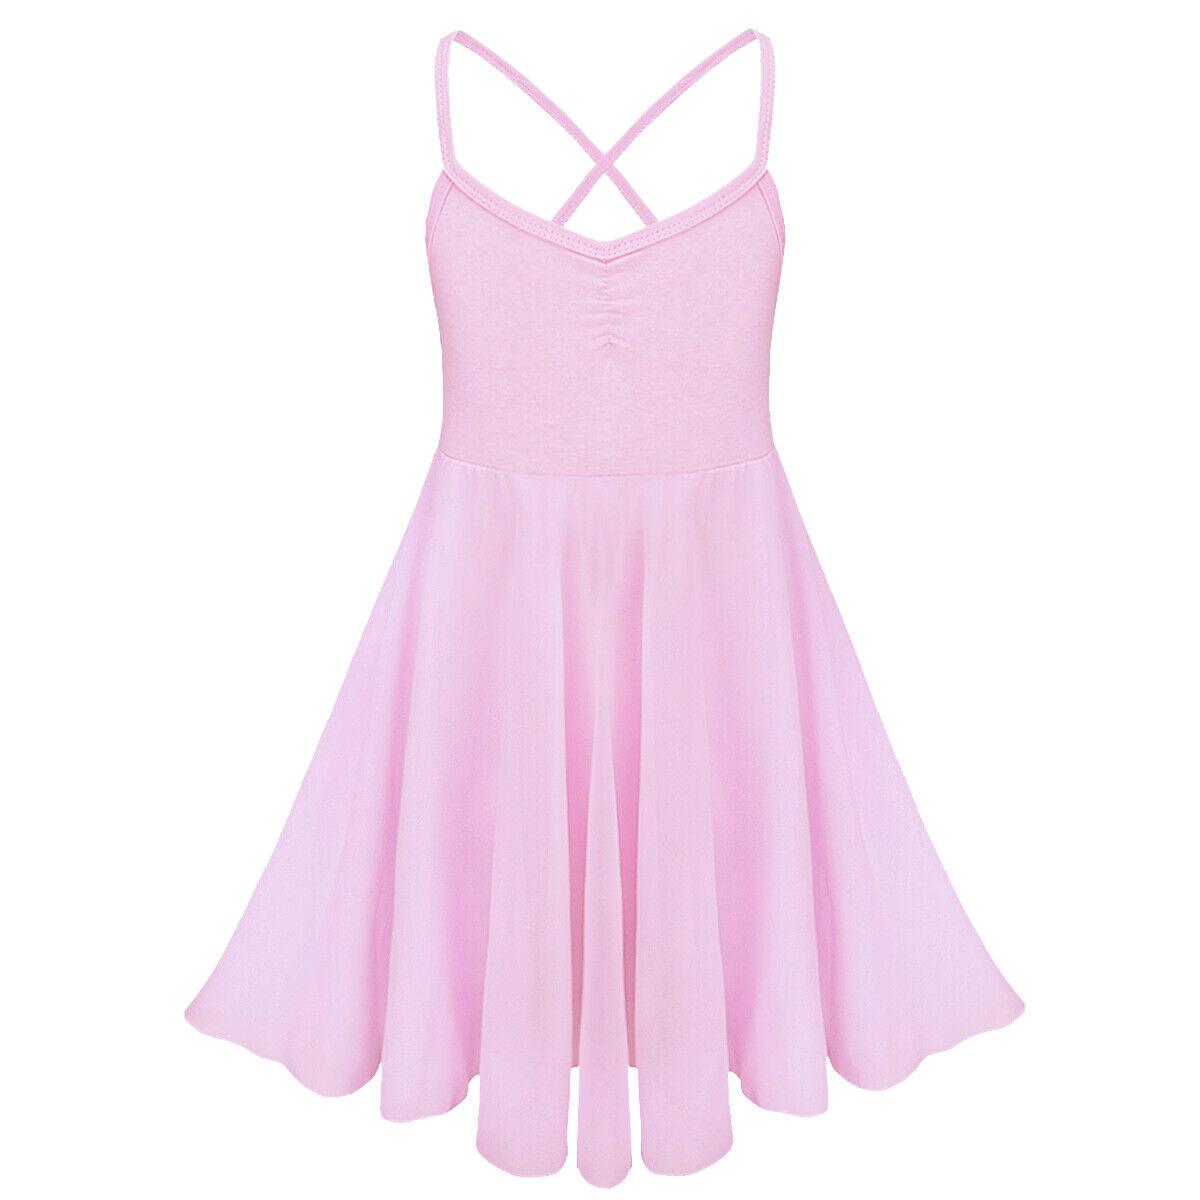 Kids Girls Chiffon Ballet Dancer Leotard Dress Gymnastics Tutu Skirt Leotard